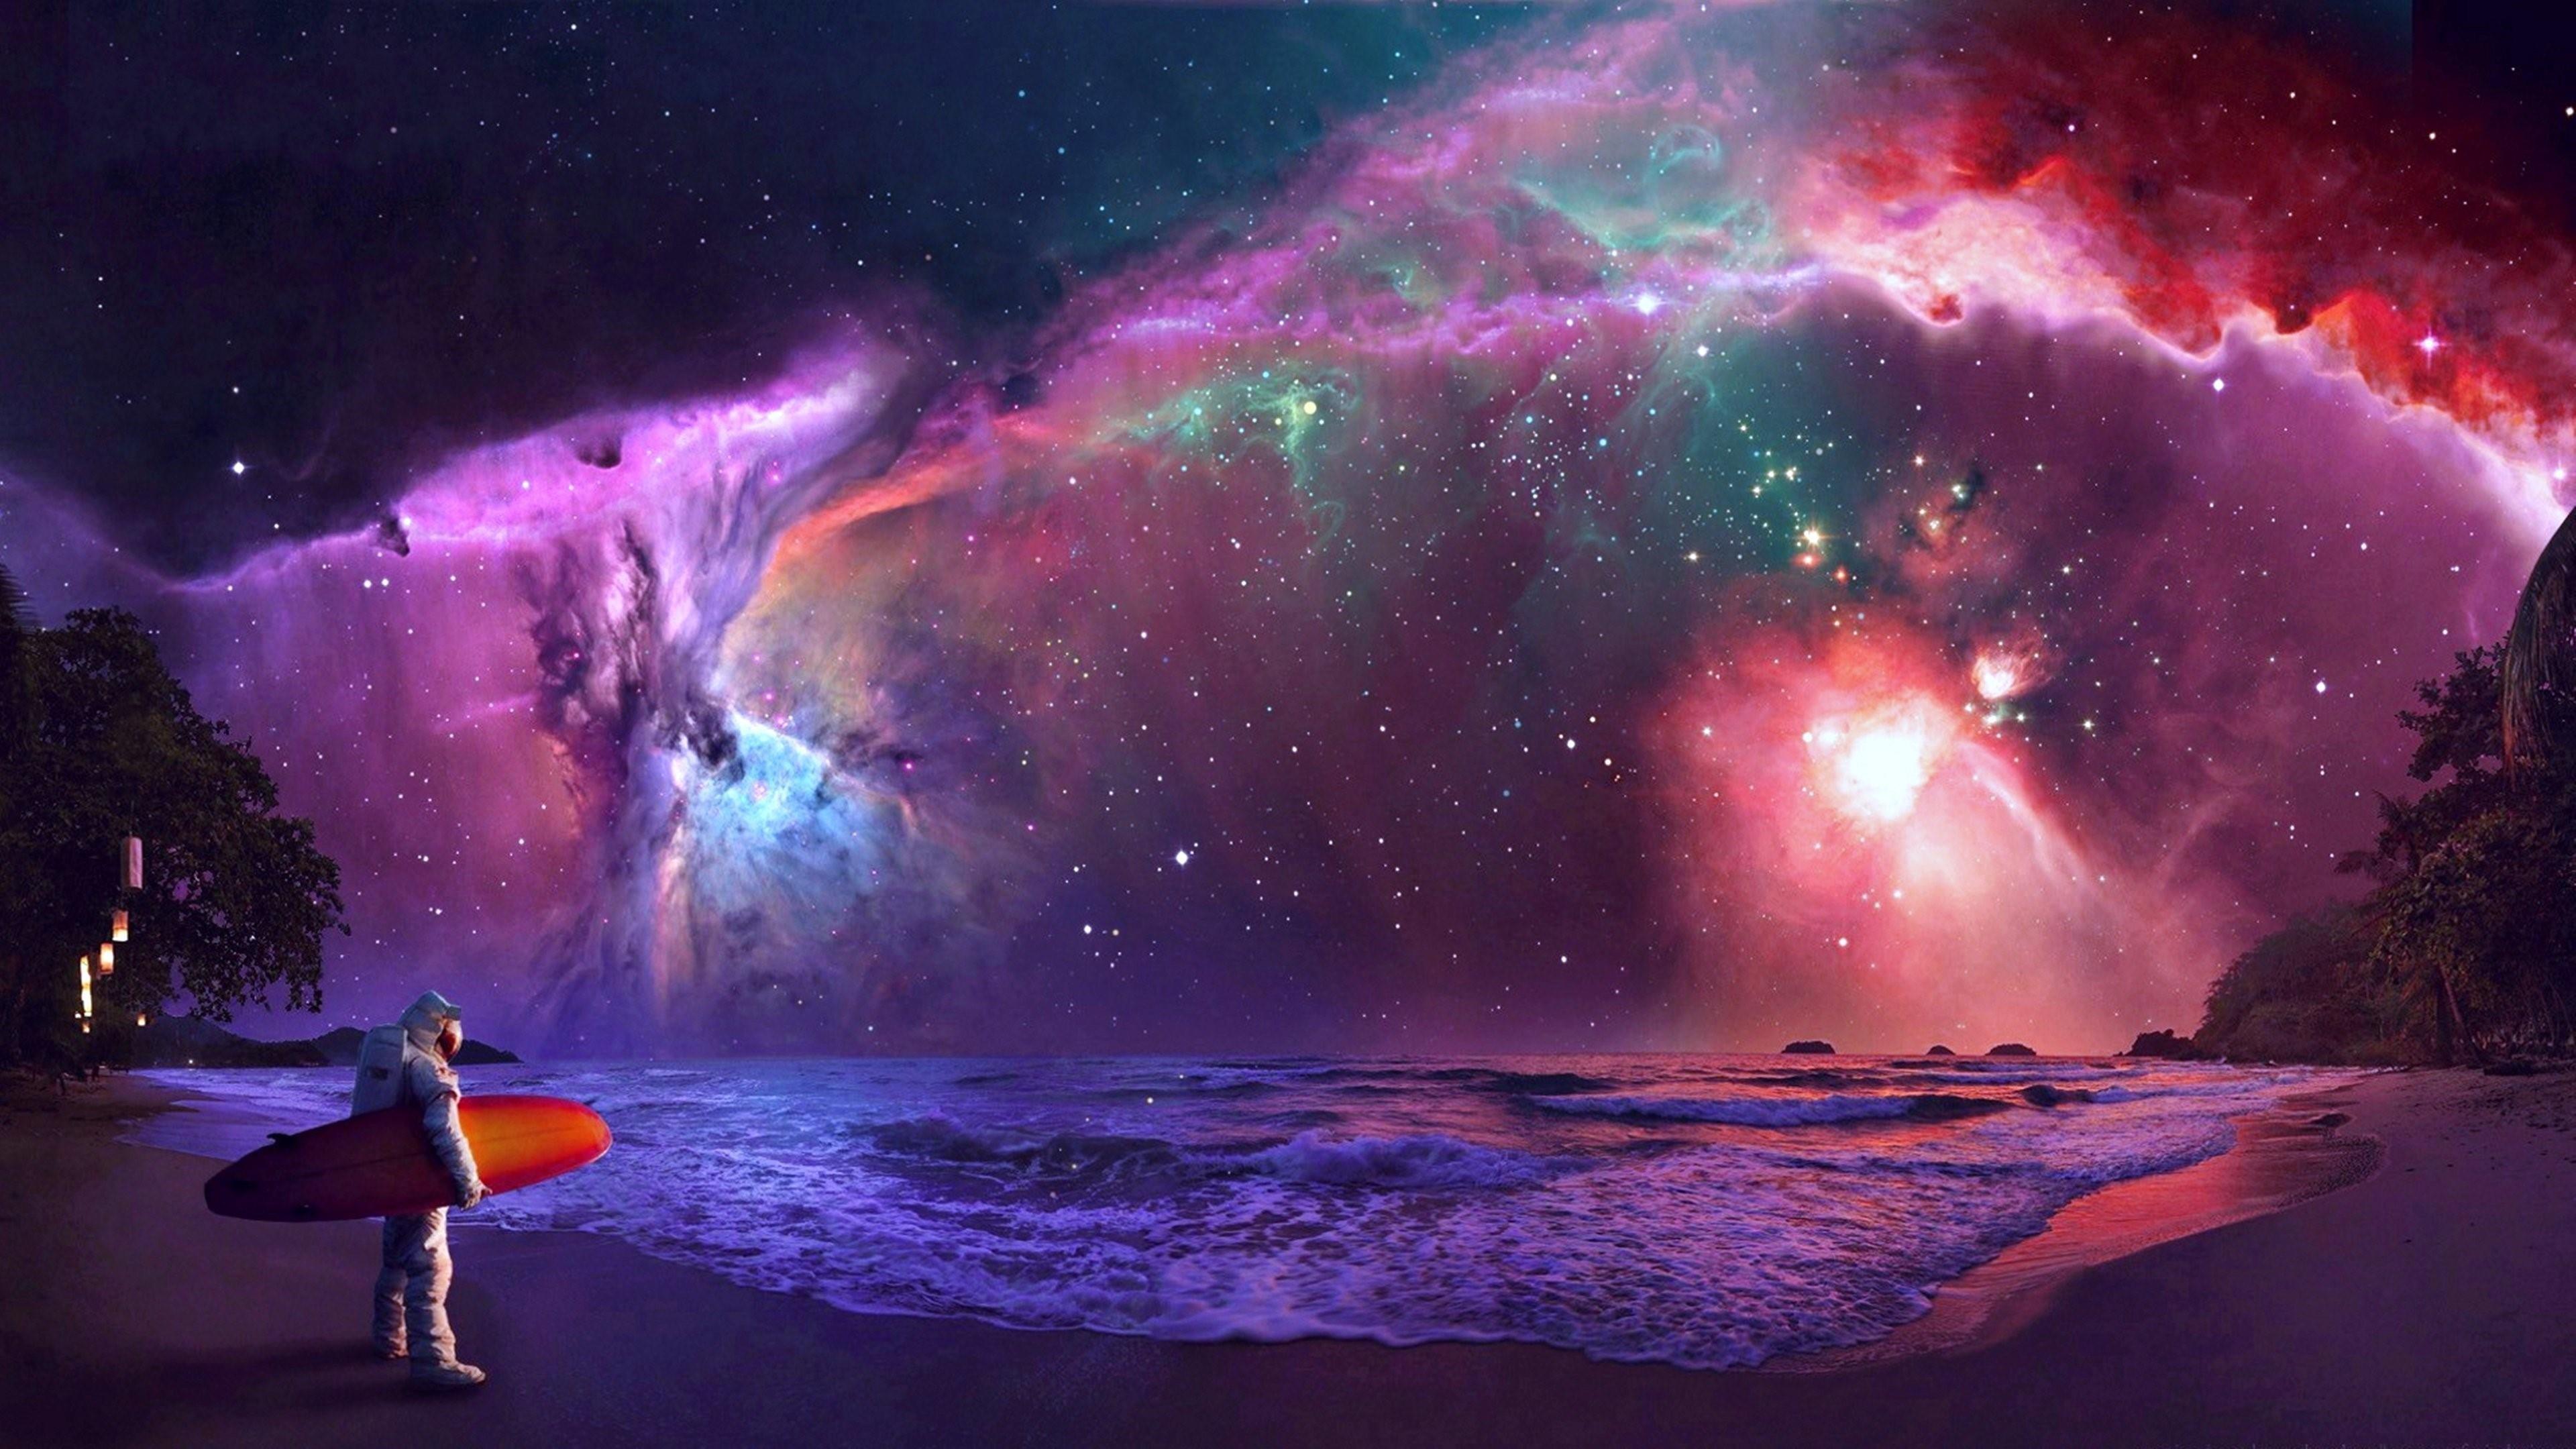 Title. Surfing astronaut – Fantasy art